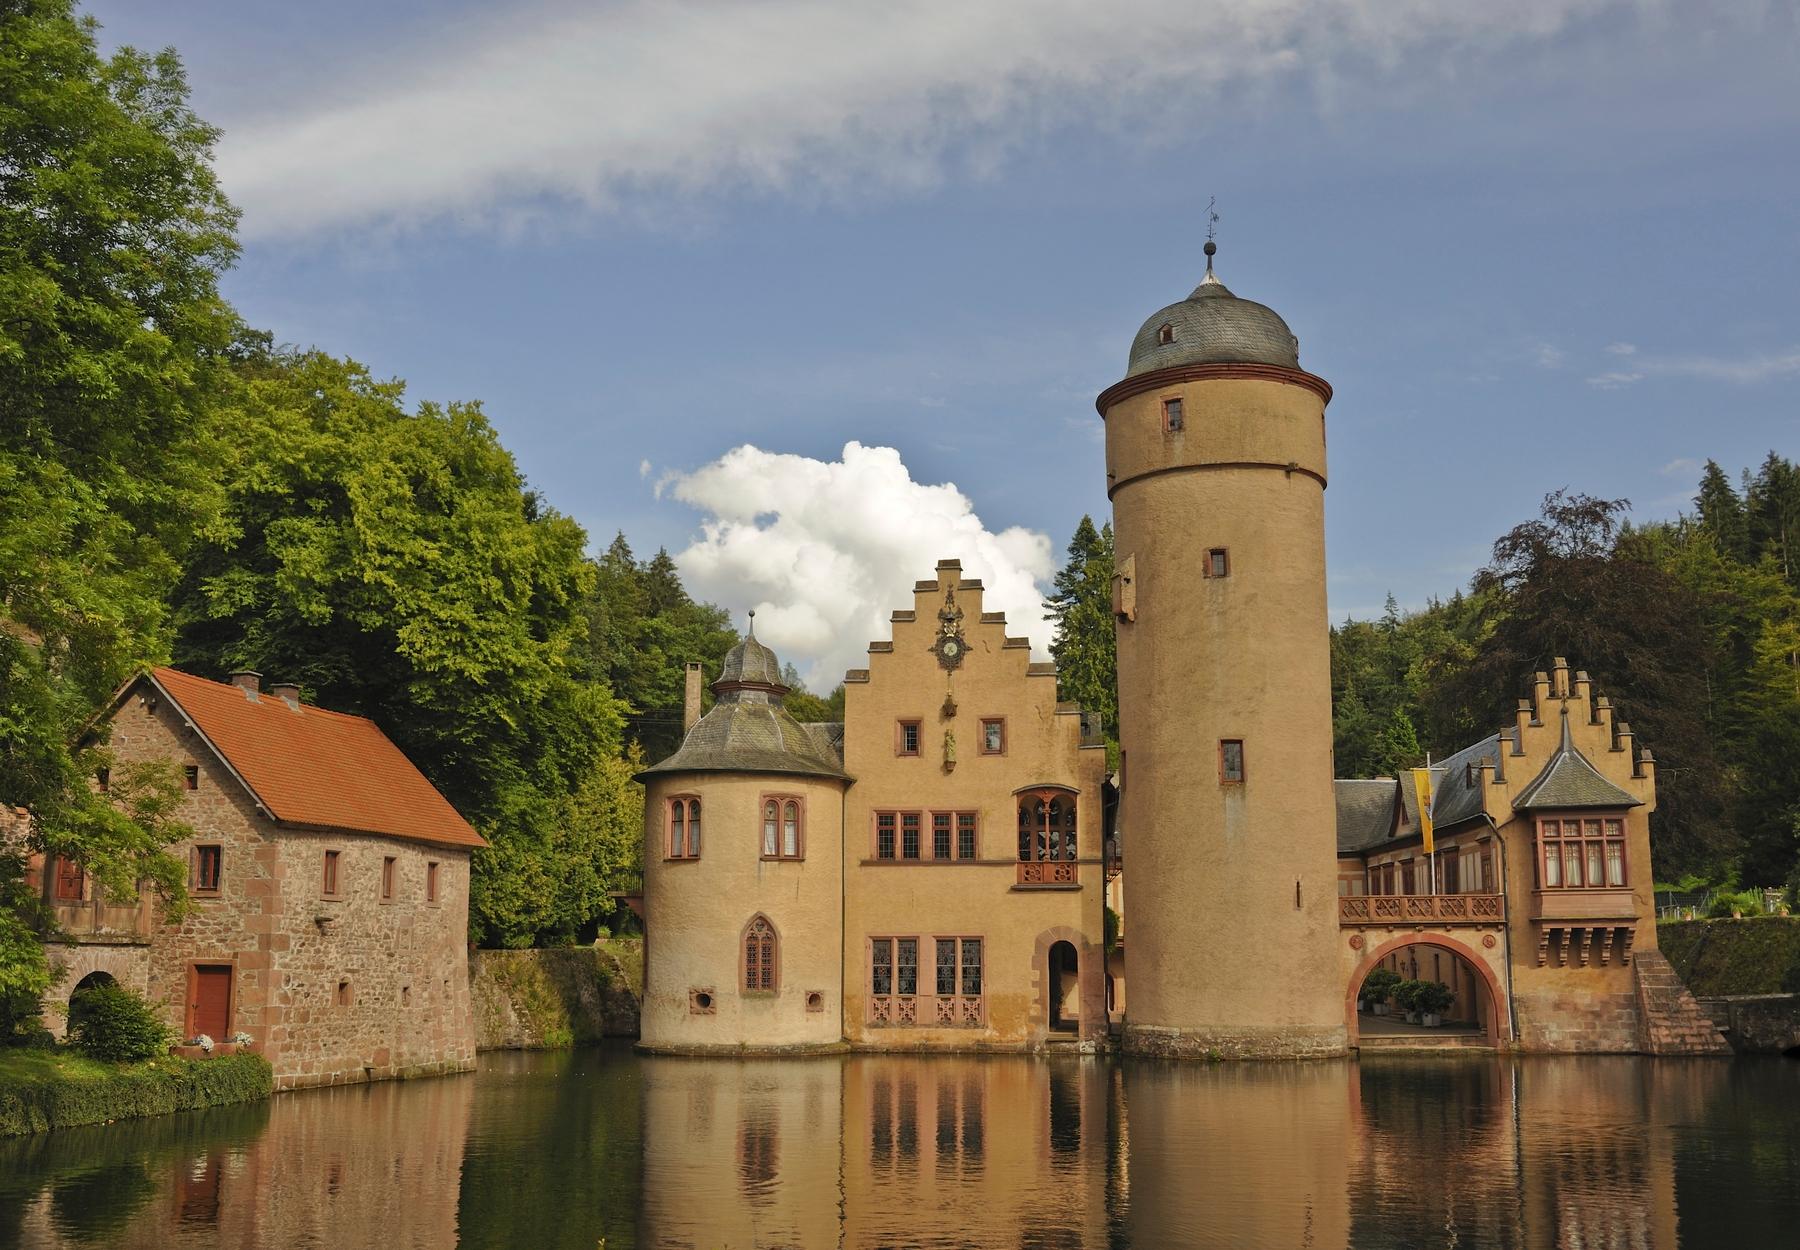 Schlösser und Burgen Deutschlands: Schloss Mespelbrunn